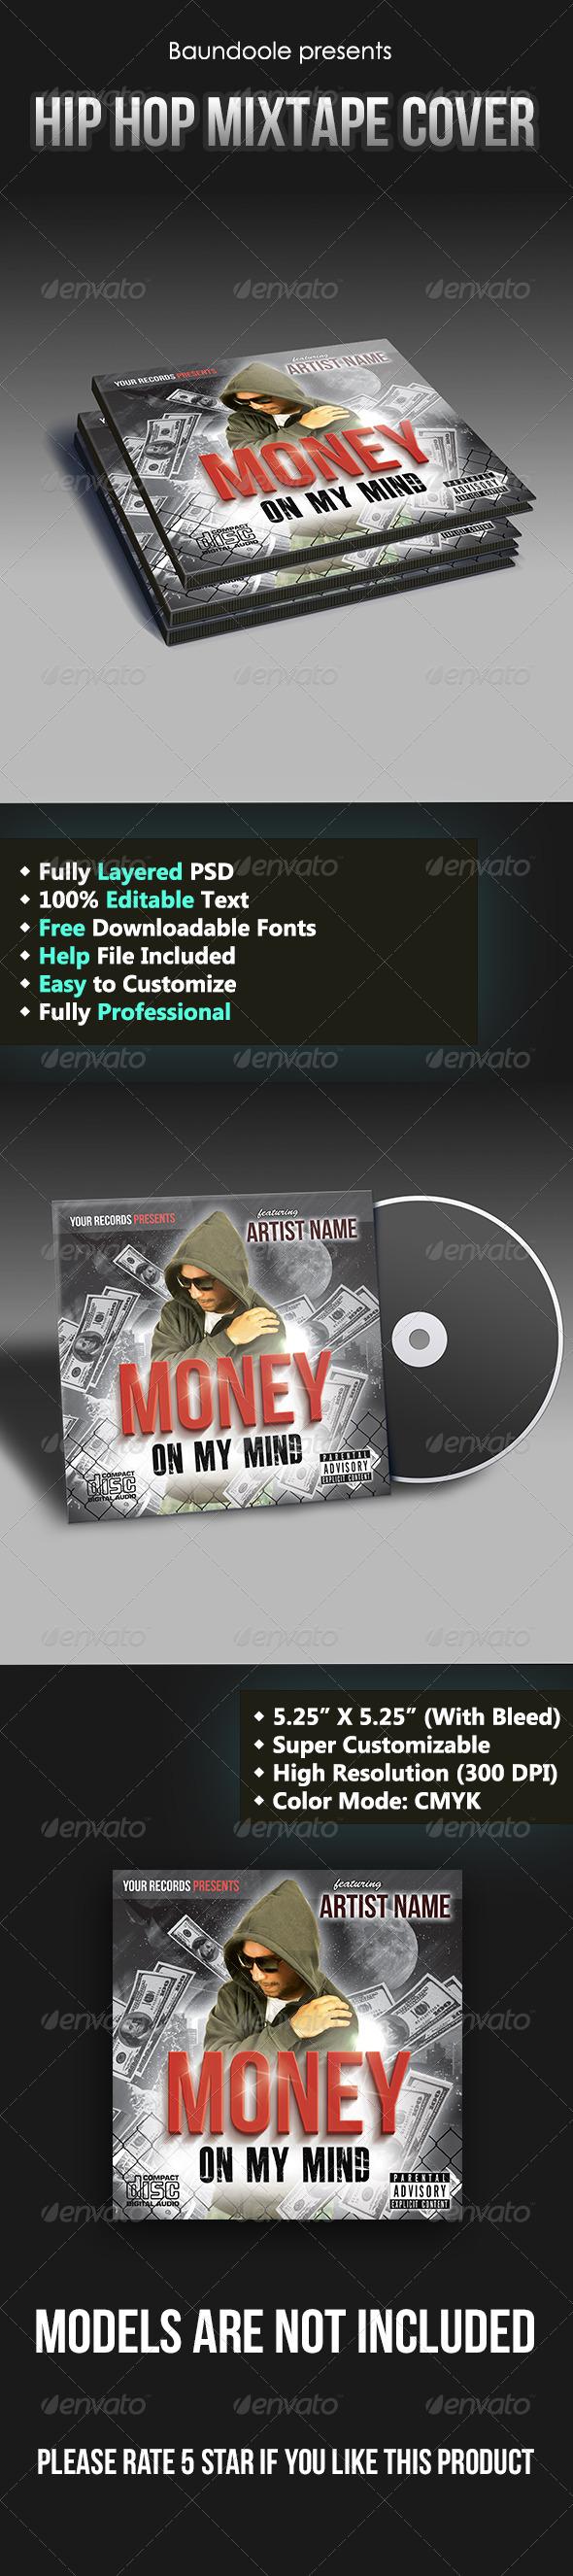 Hip Hop Mixtape Cover Template - CD & DVD Artwork Print Templates